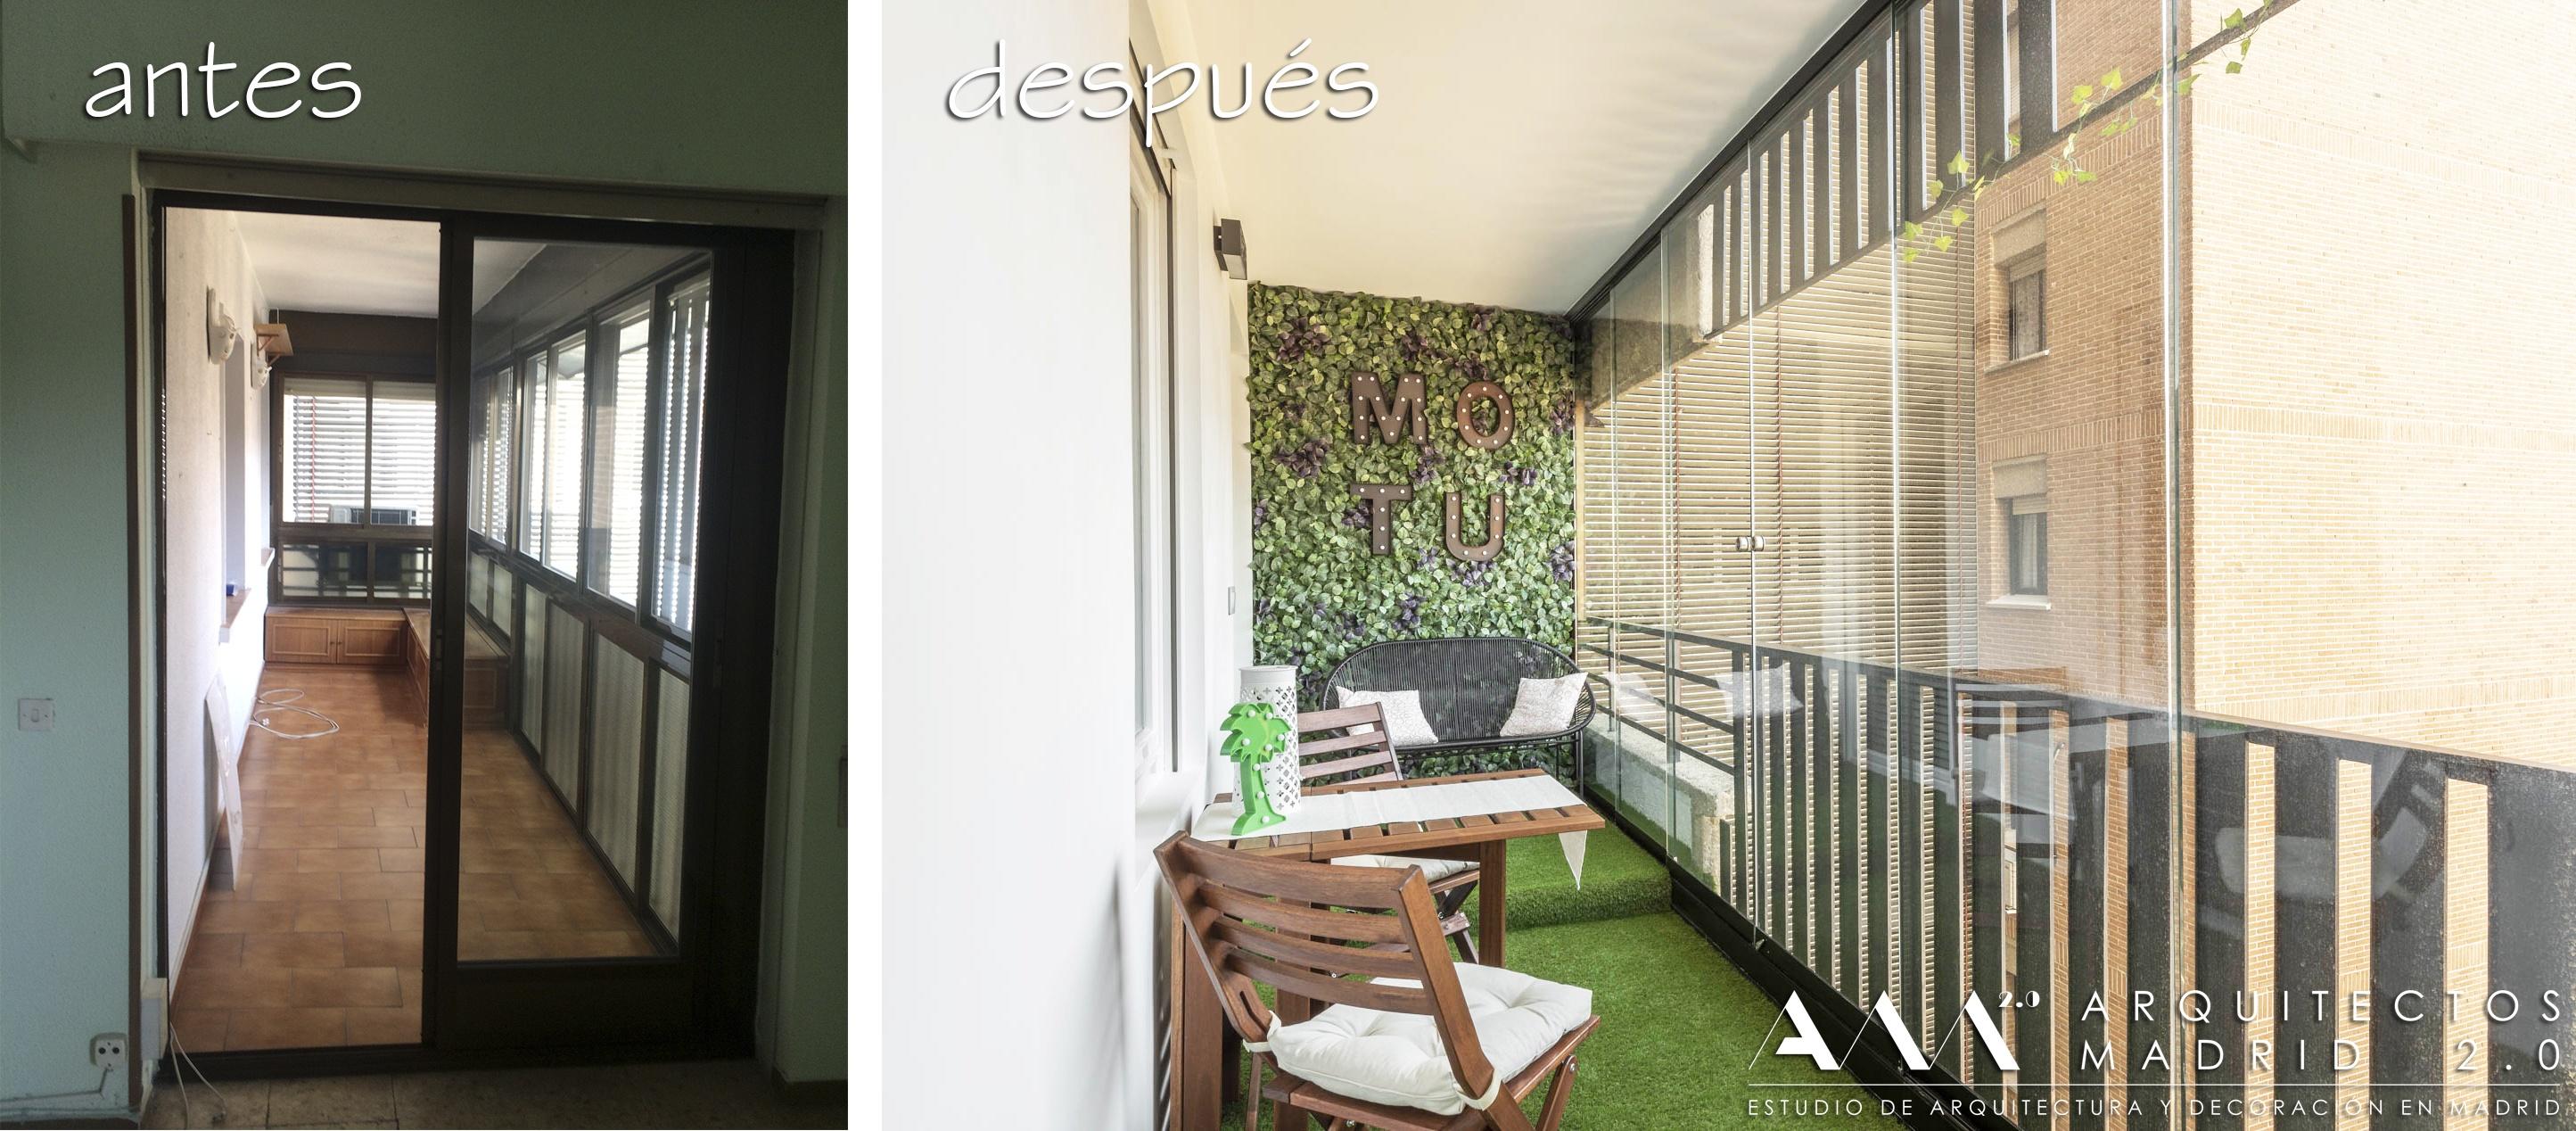 antes-después-reforma-vivienda-housing-reform-architects-before-after